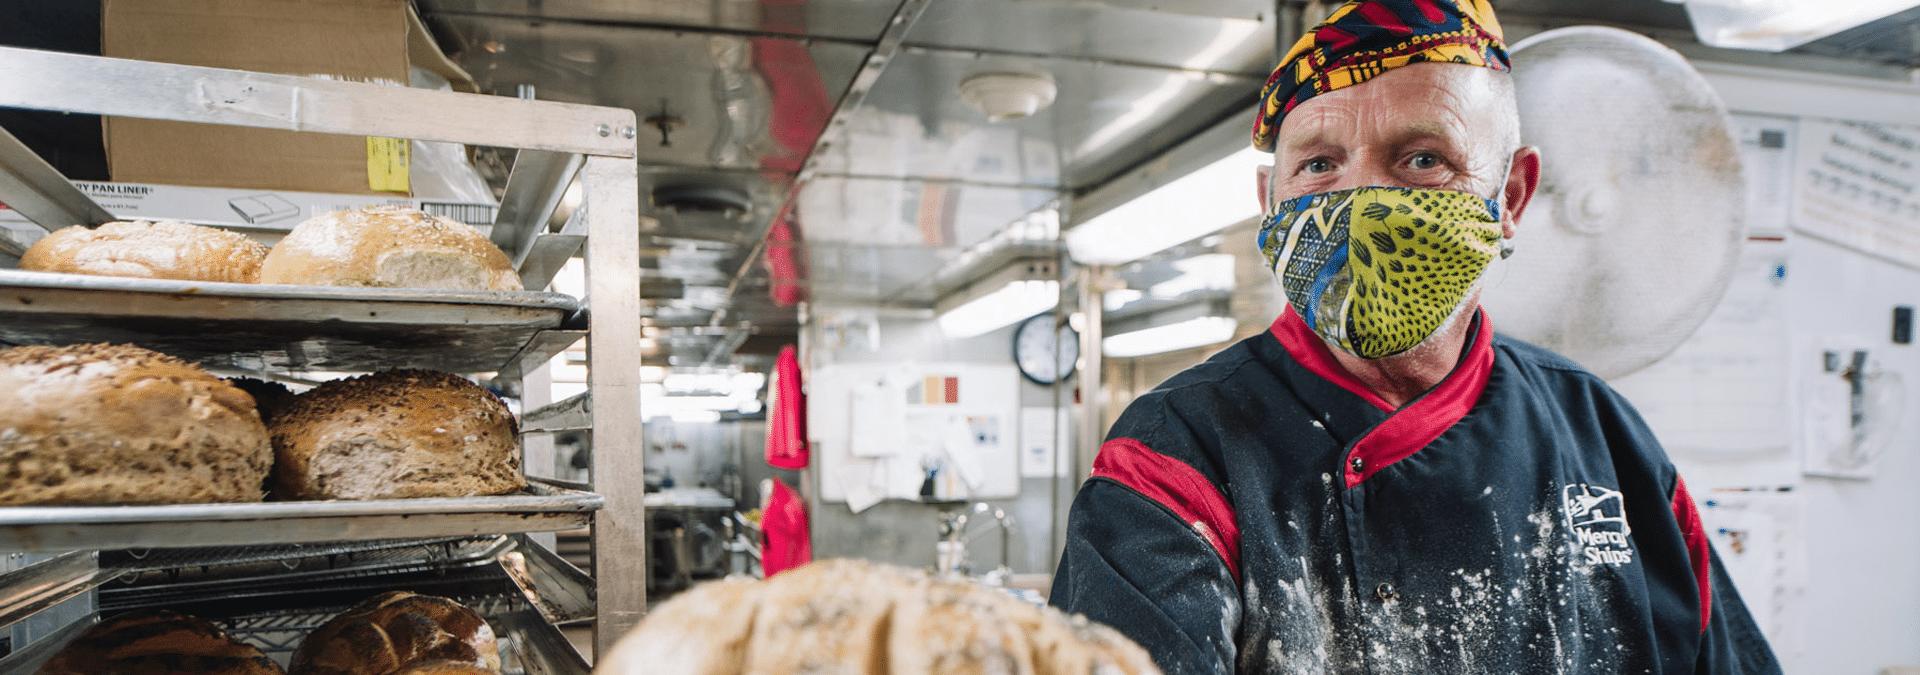 Bäcker Harry Reitsma präsentiert sein Brot